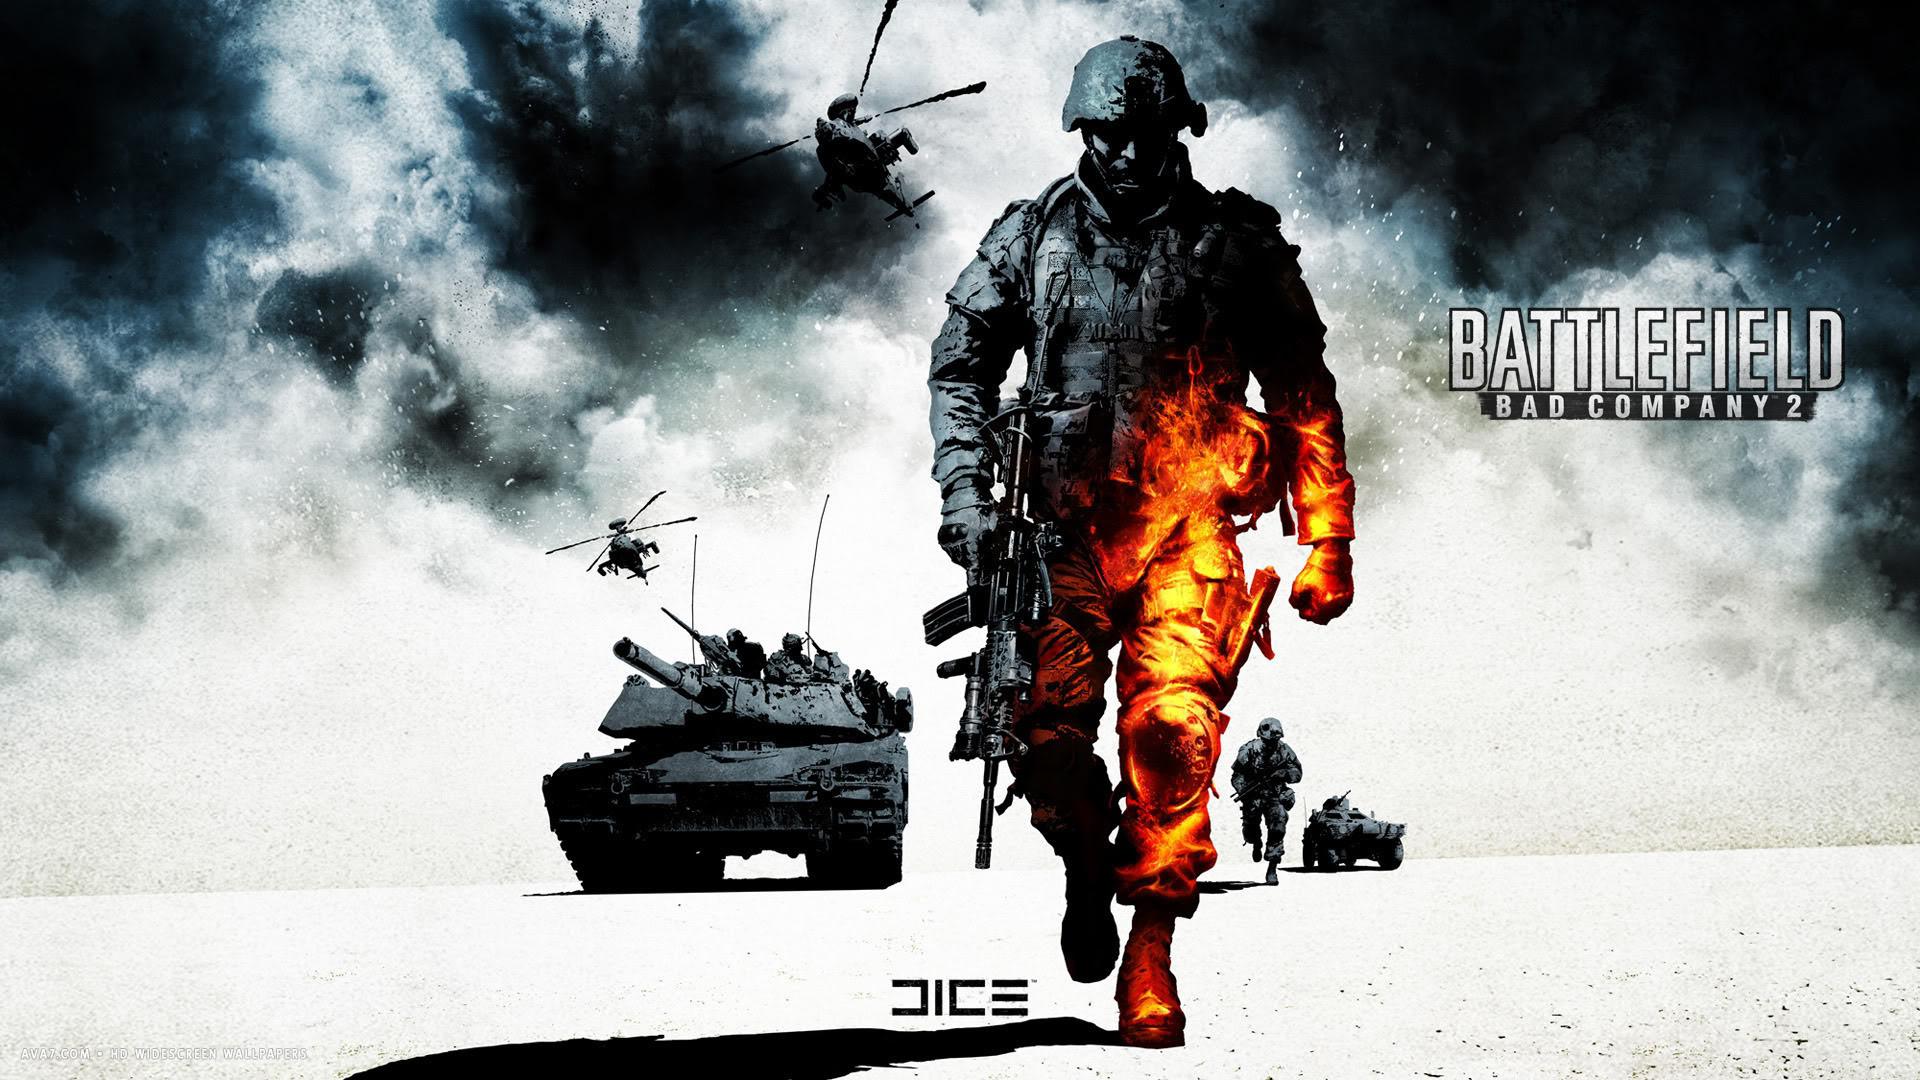 Battlefield Bad Company 2 Game Bfbc2 Artwork Hd Widescreen